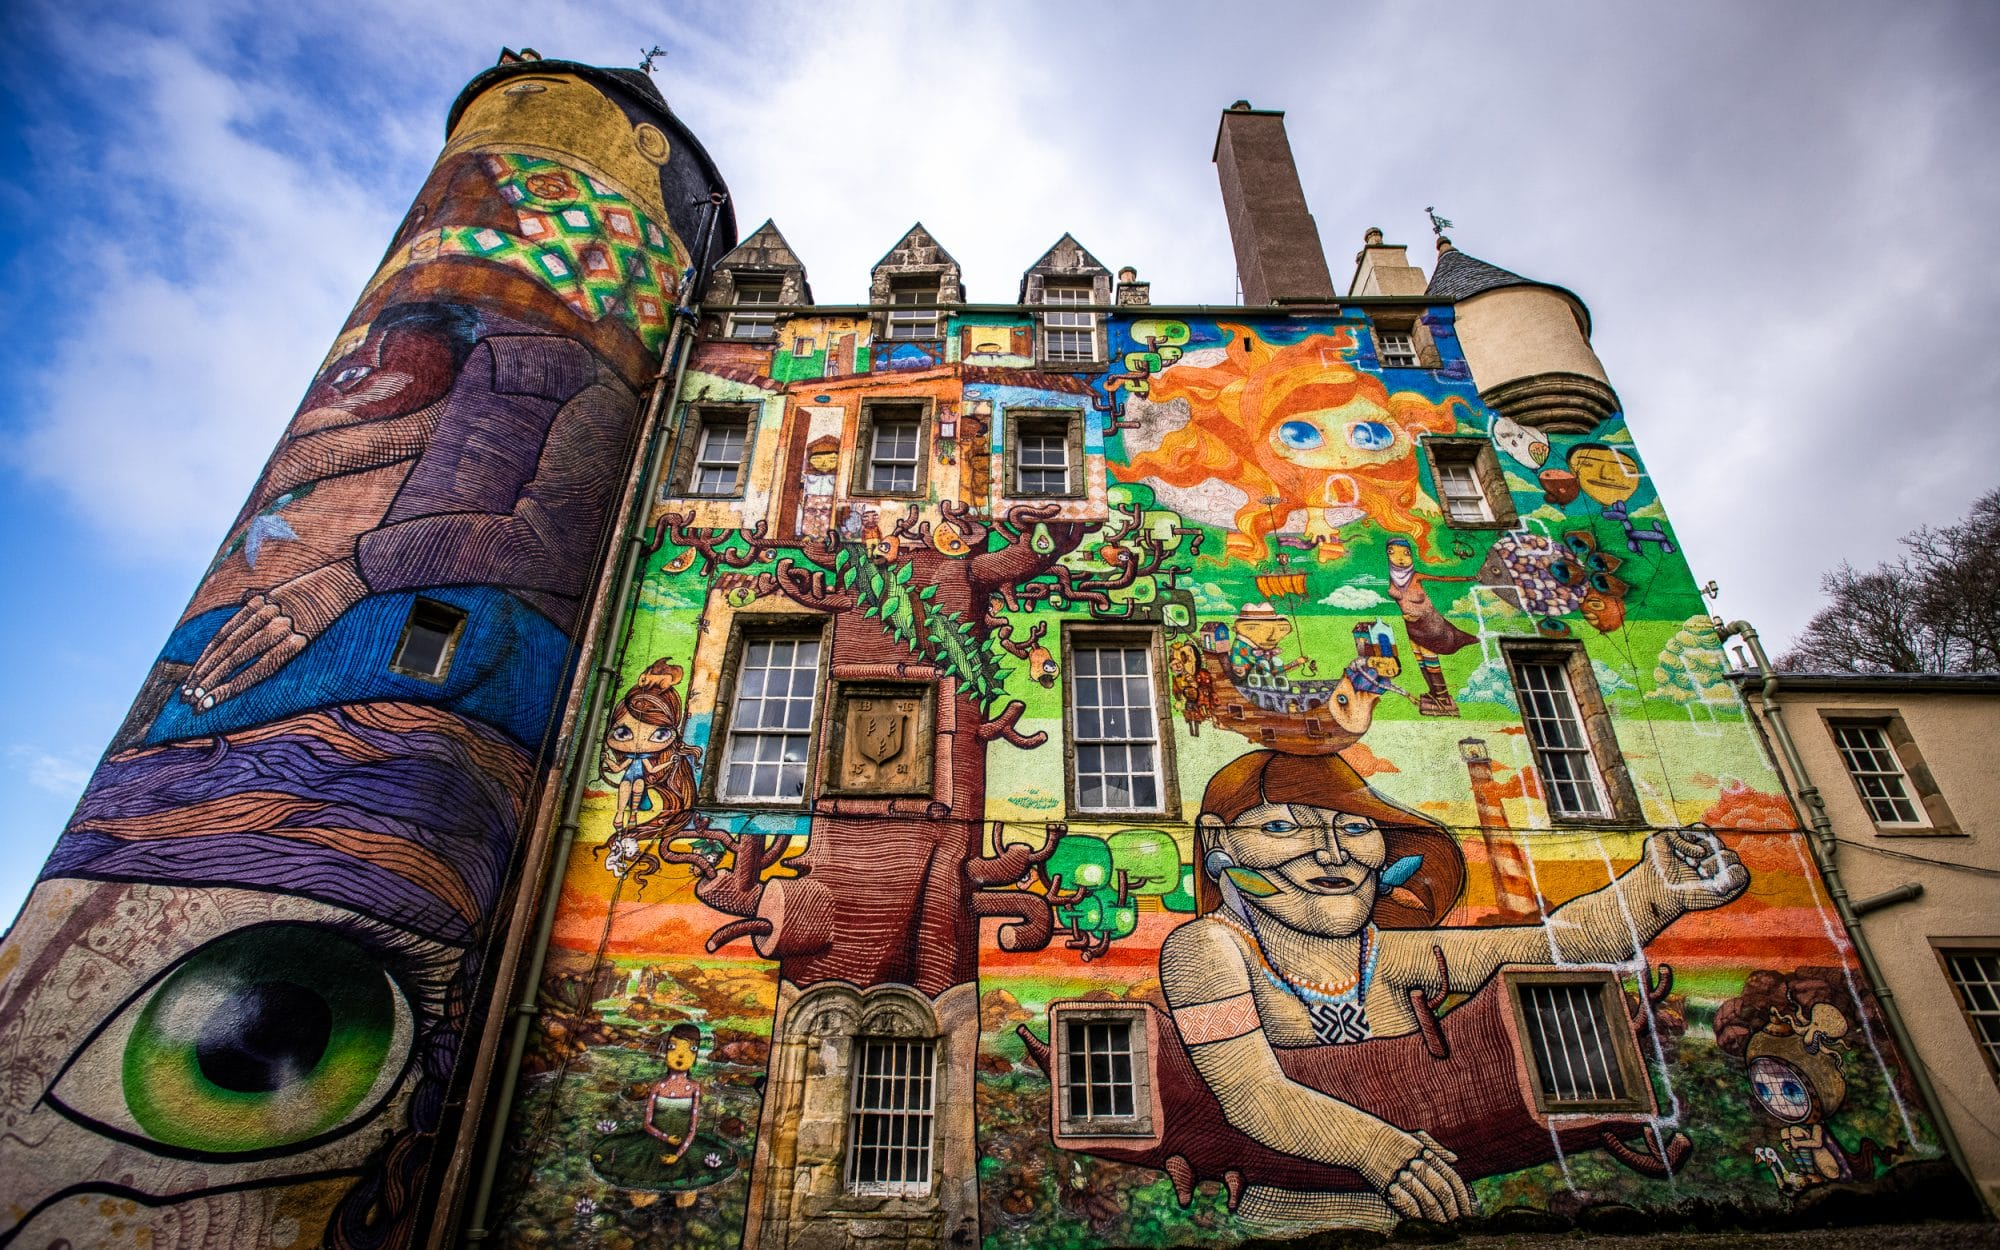 kelburn castle el castillo del grafiti